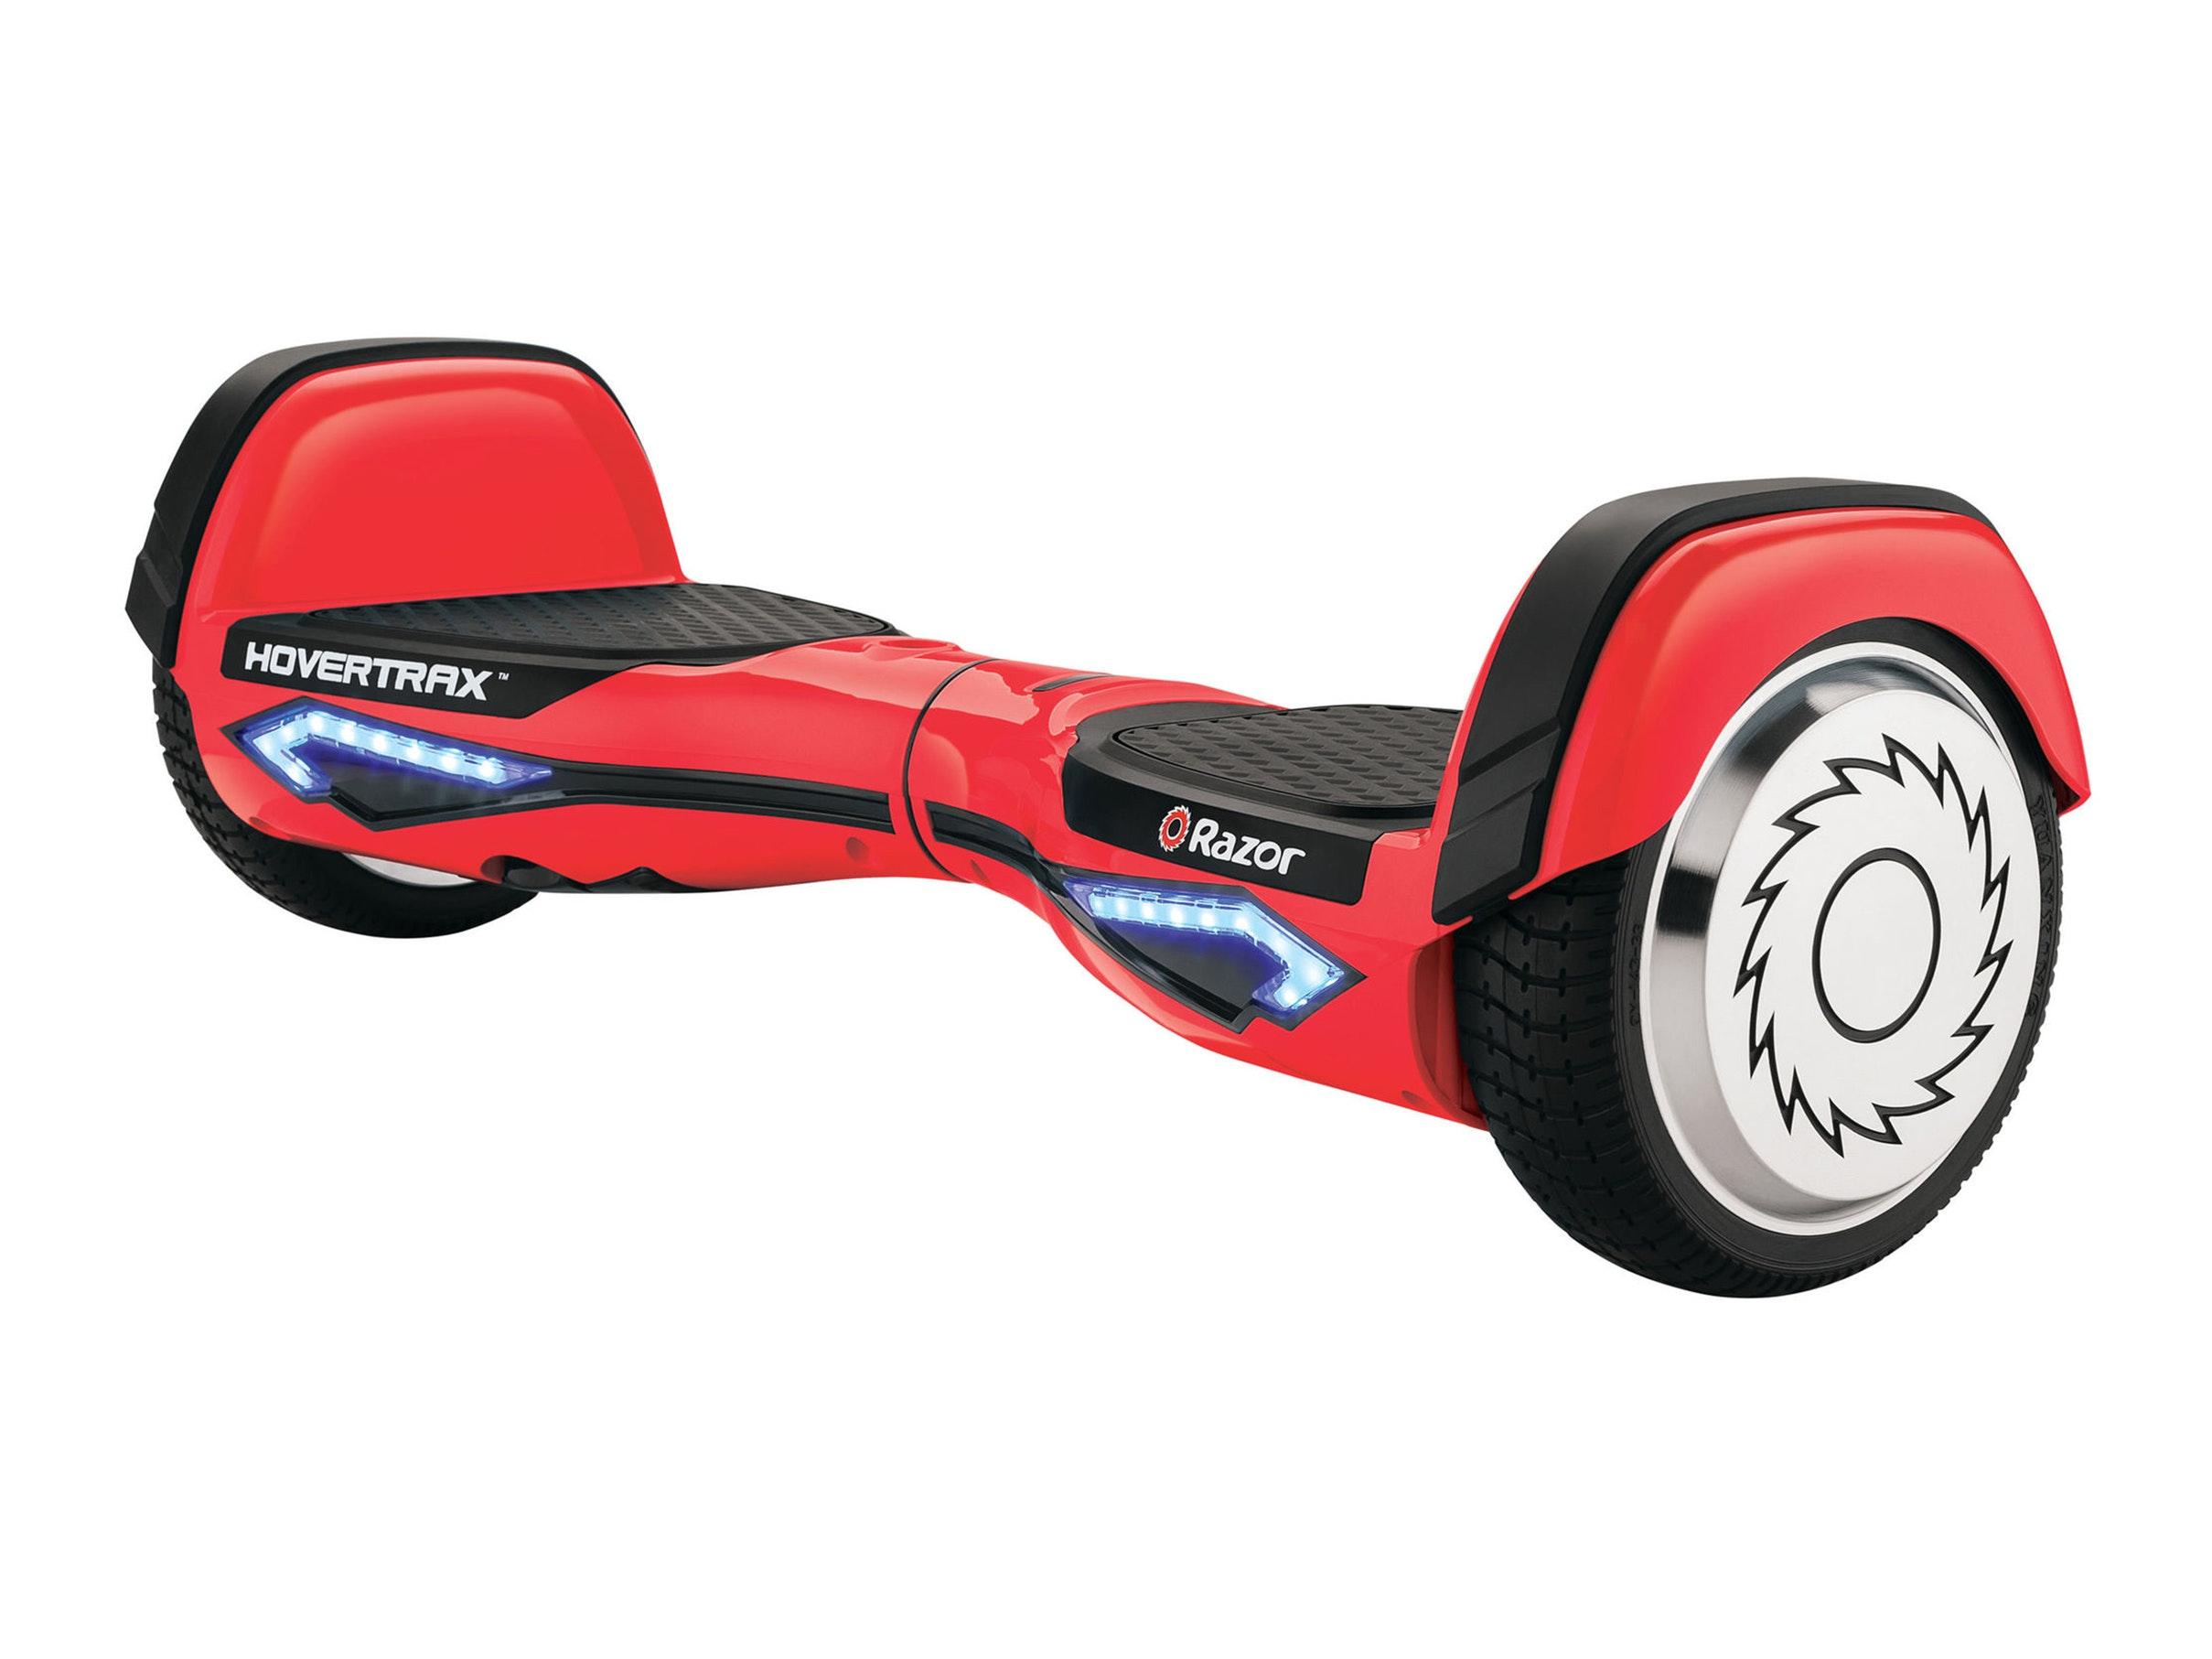 Razor Hovertrax 2.0 Hoverboard - Red